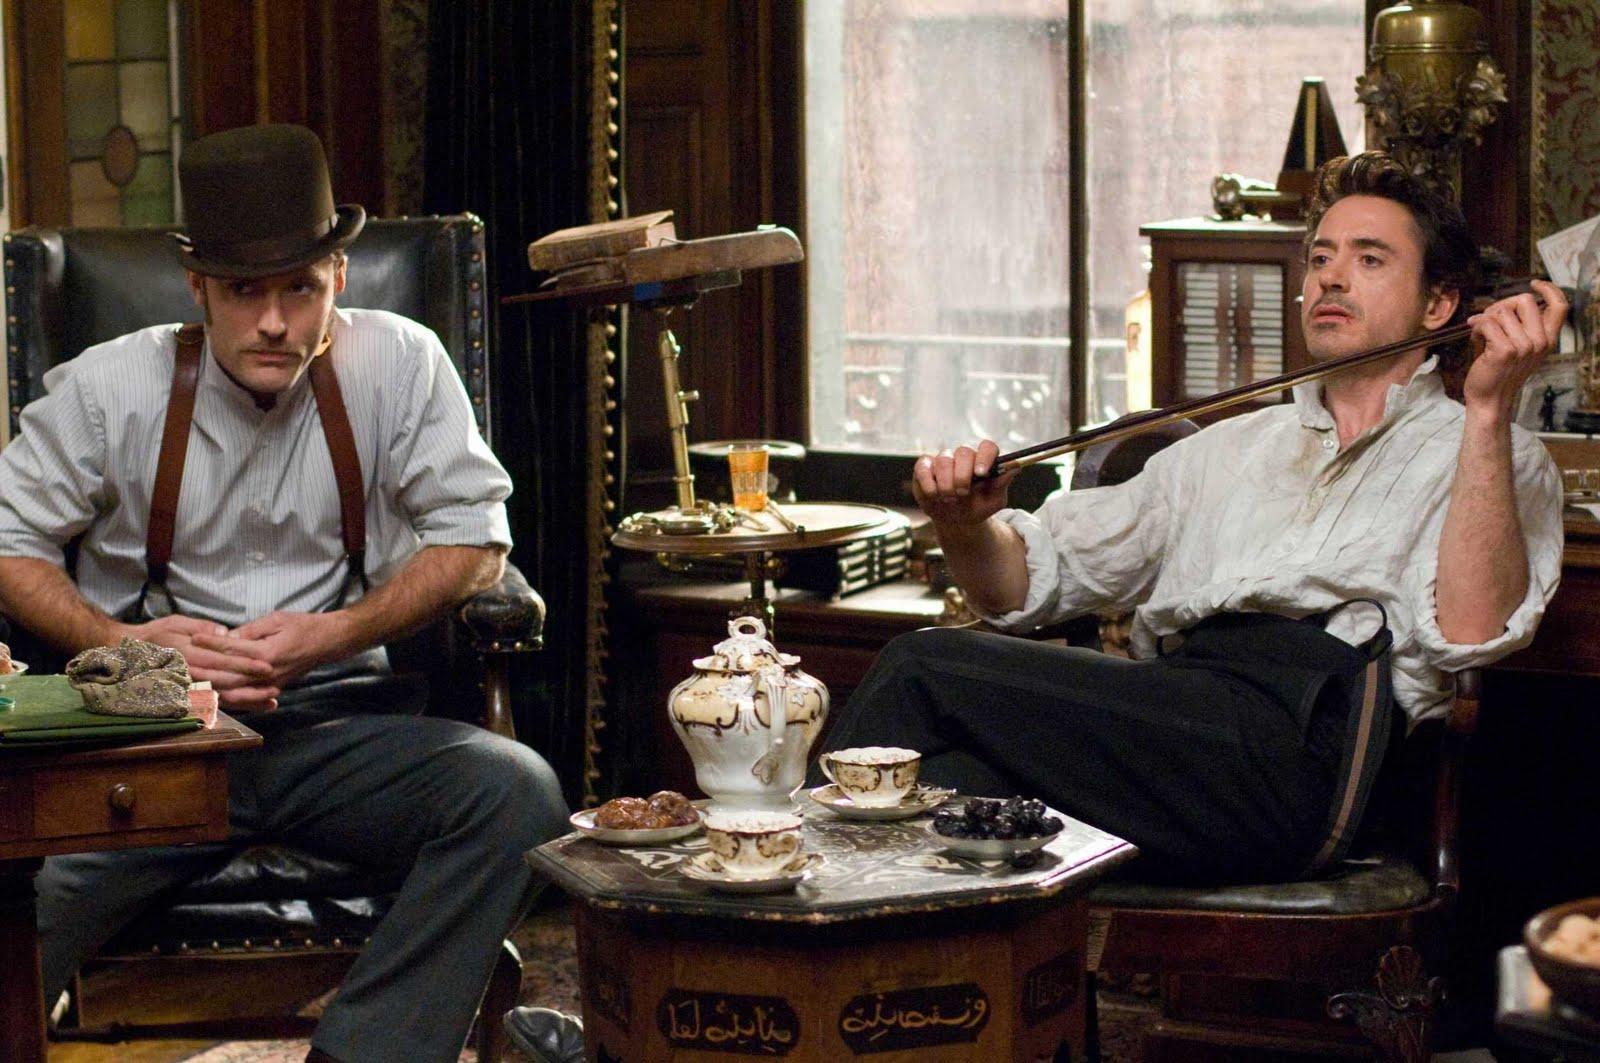 filmes sherlock holmes Sherlock Holmes: O Signo dos Quatro: Resenha, Livro Arthur Conan Doyle